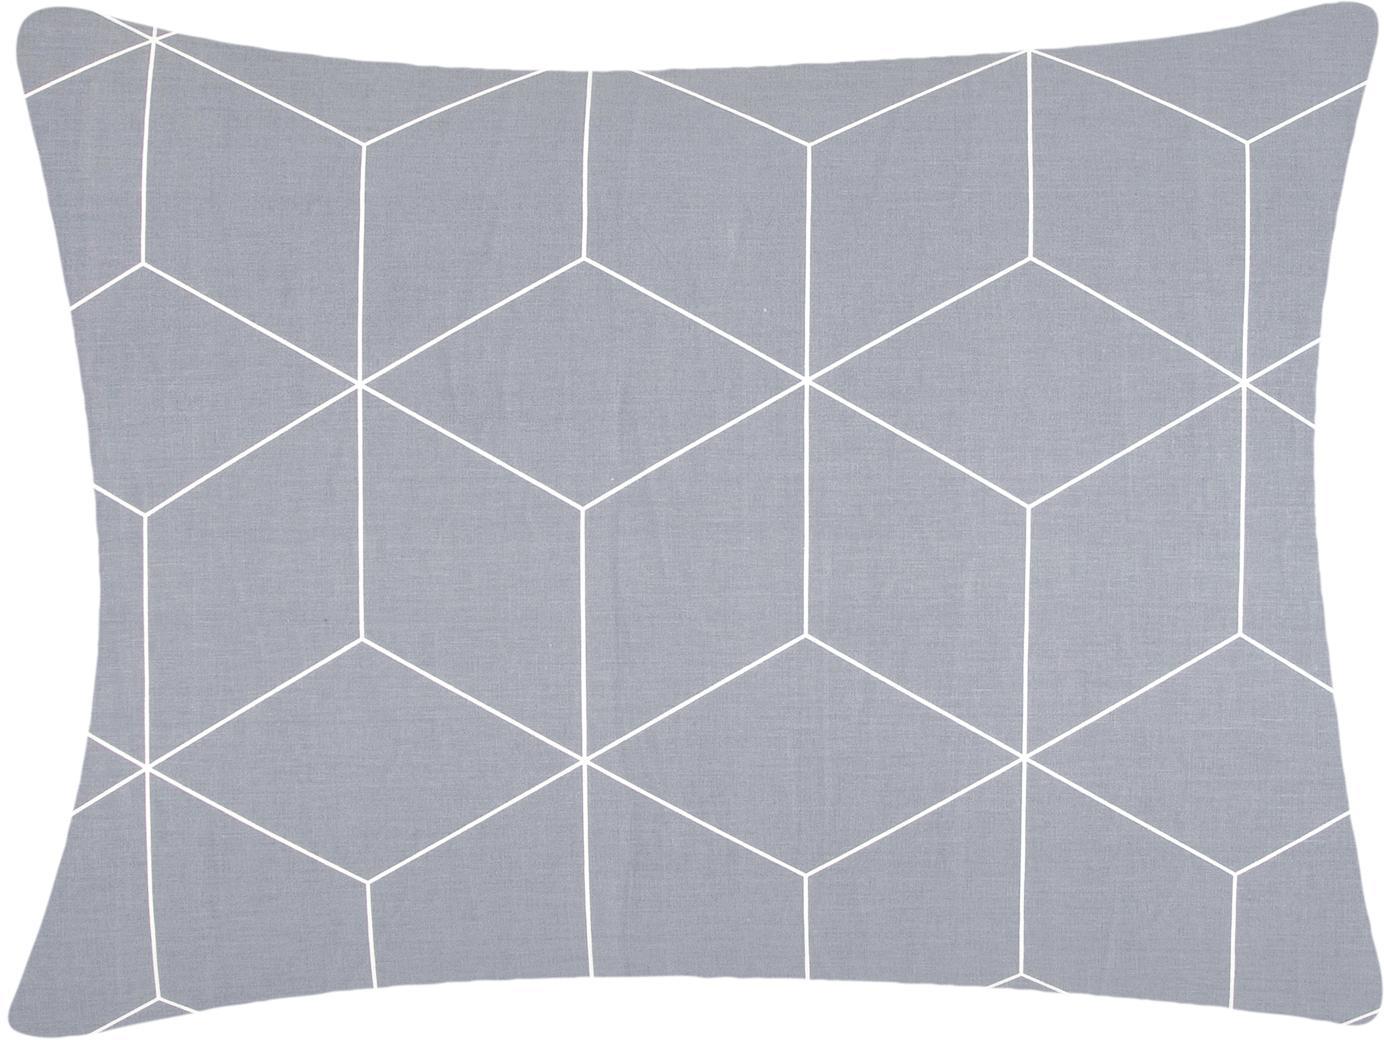 Funda de almohada de tejido renforcé Lynn, Gris, blanco crema, An 50 x L 70 cm